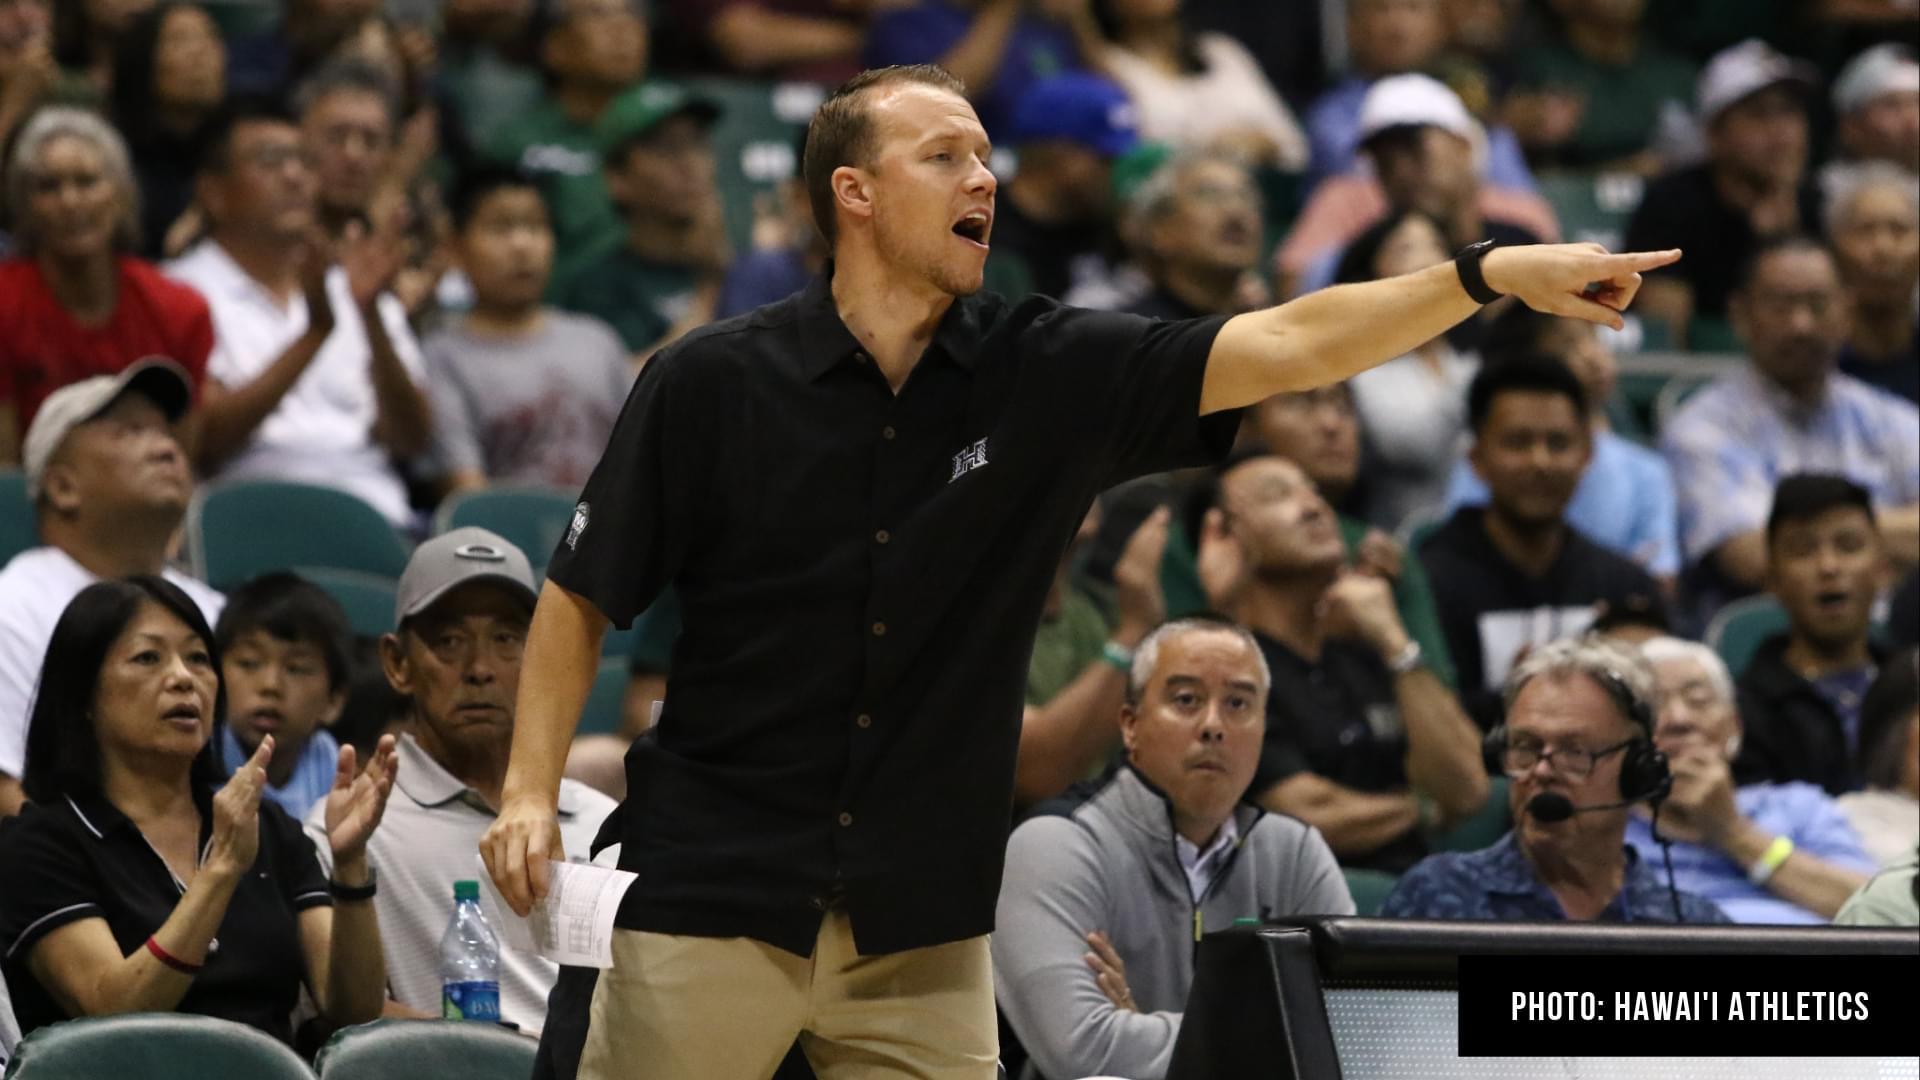 Coach's Profile: John Montgomery